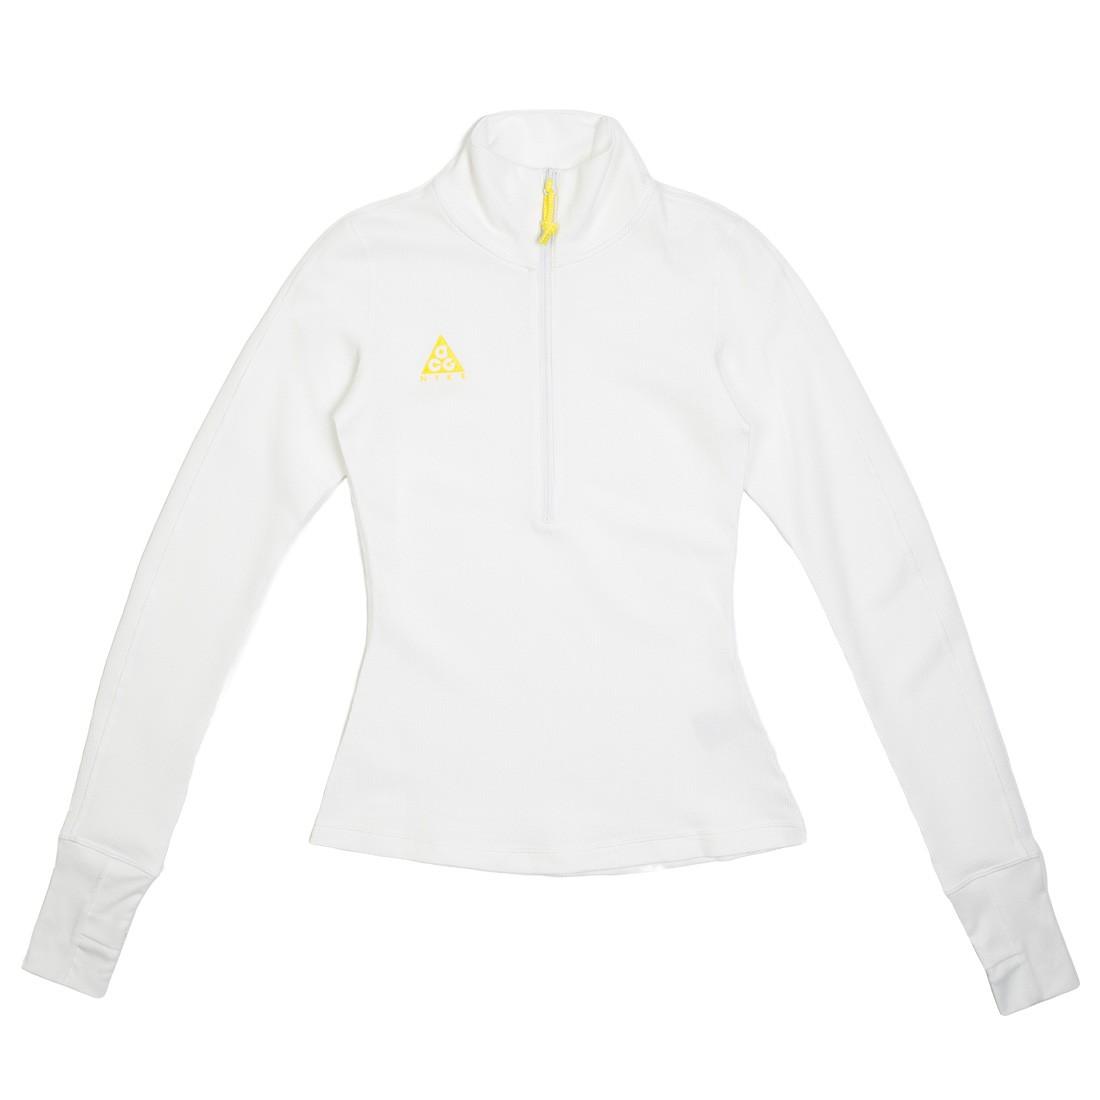 Nike Women Nrg Acg Thermal Long Sleeves Tee (summit white / opti yellow)